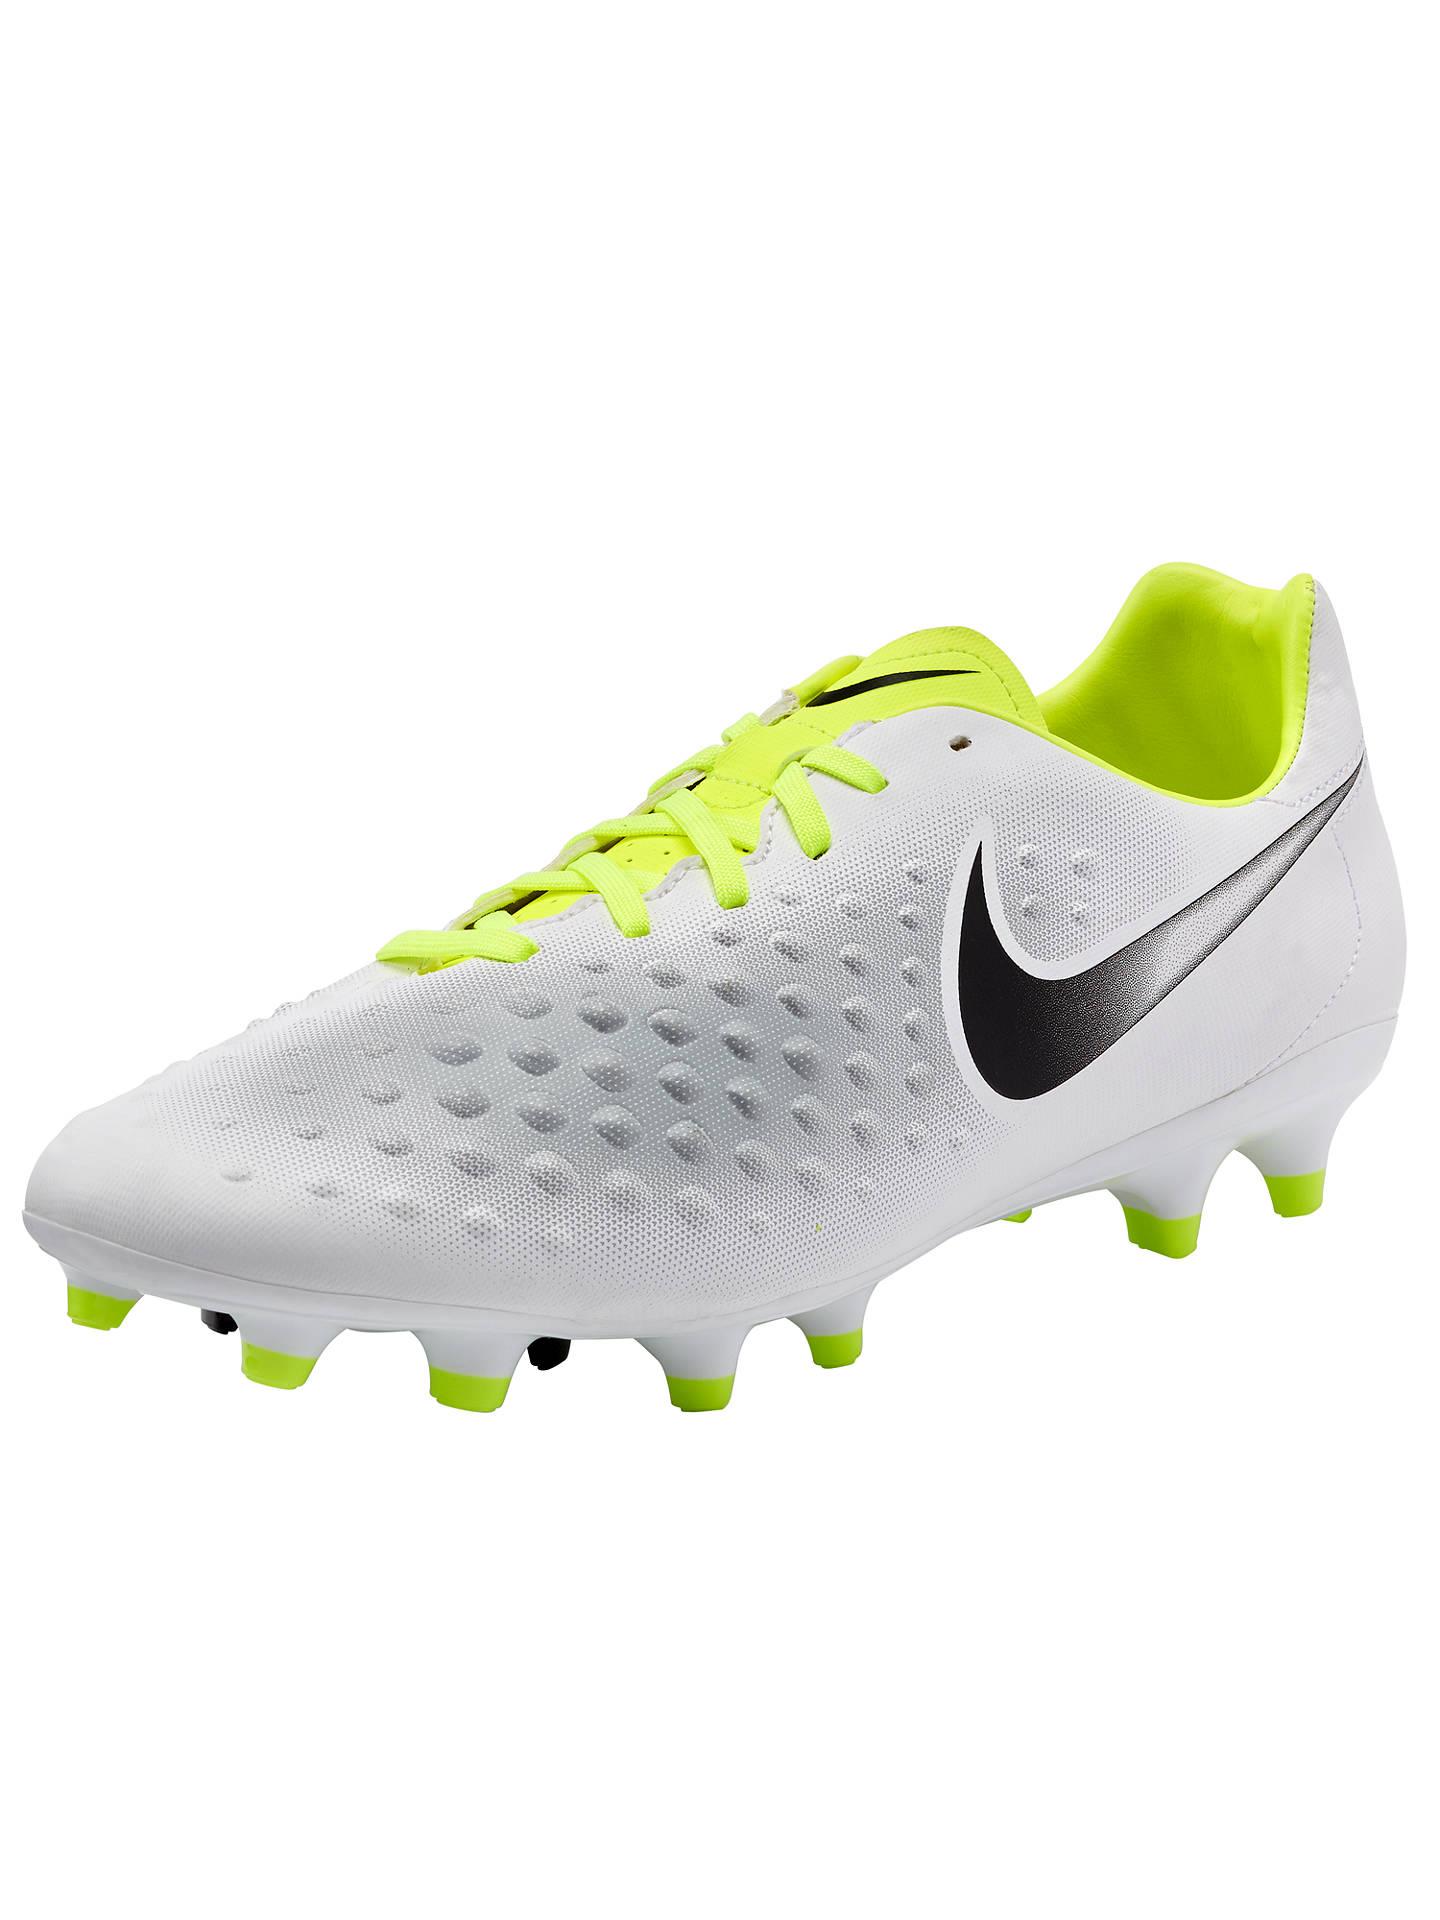 35723c1c457f Nike Magista Onda II Firm-Ground Football Boots at John Lewis   Partners